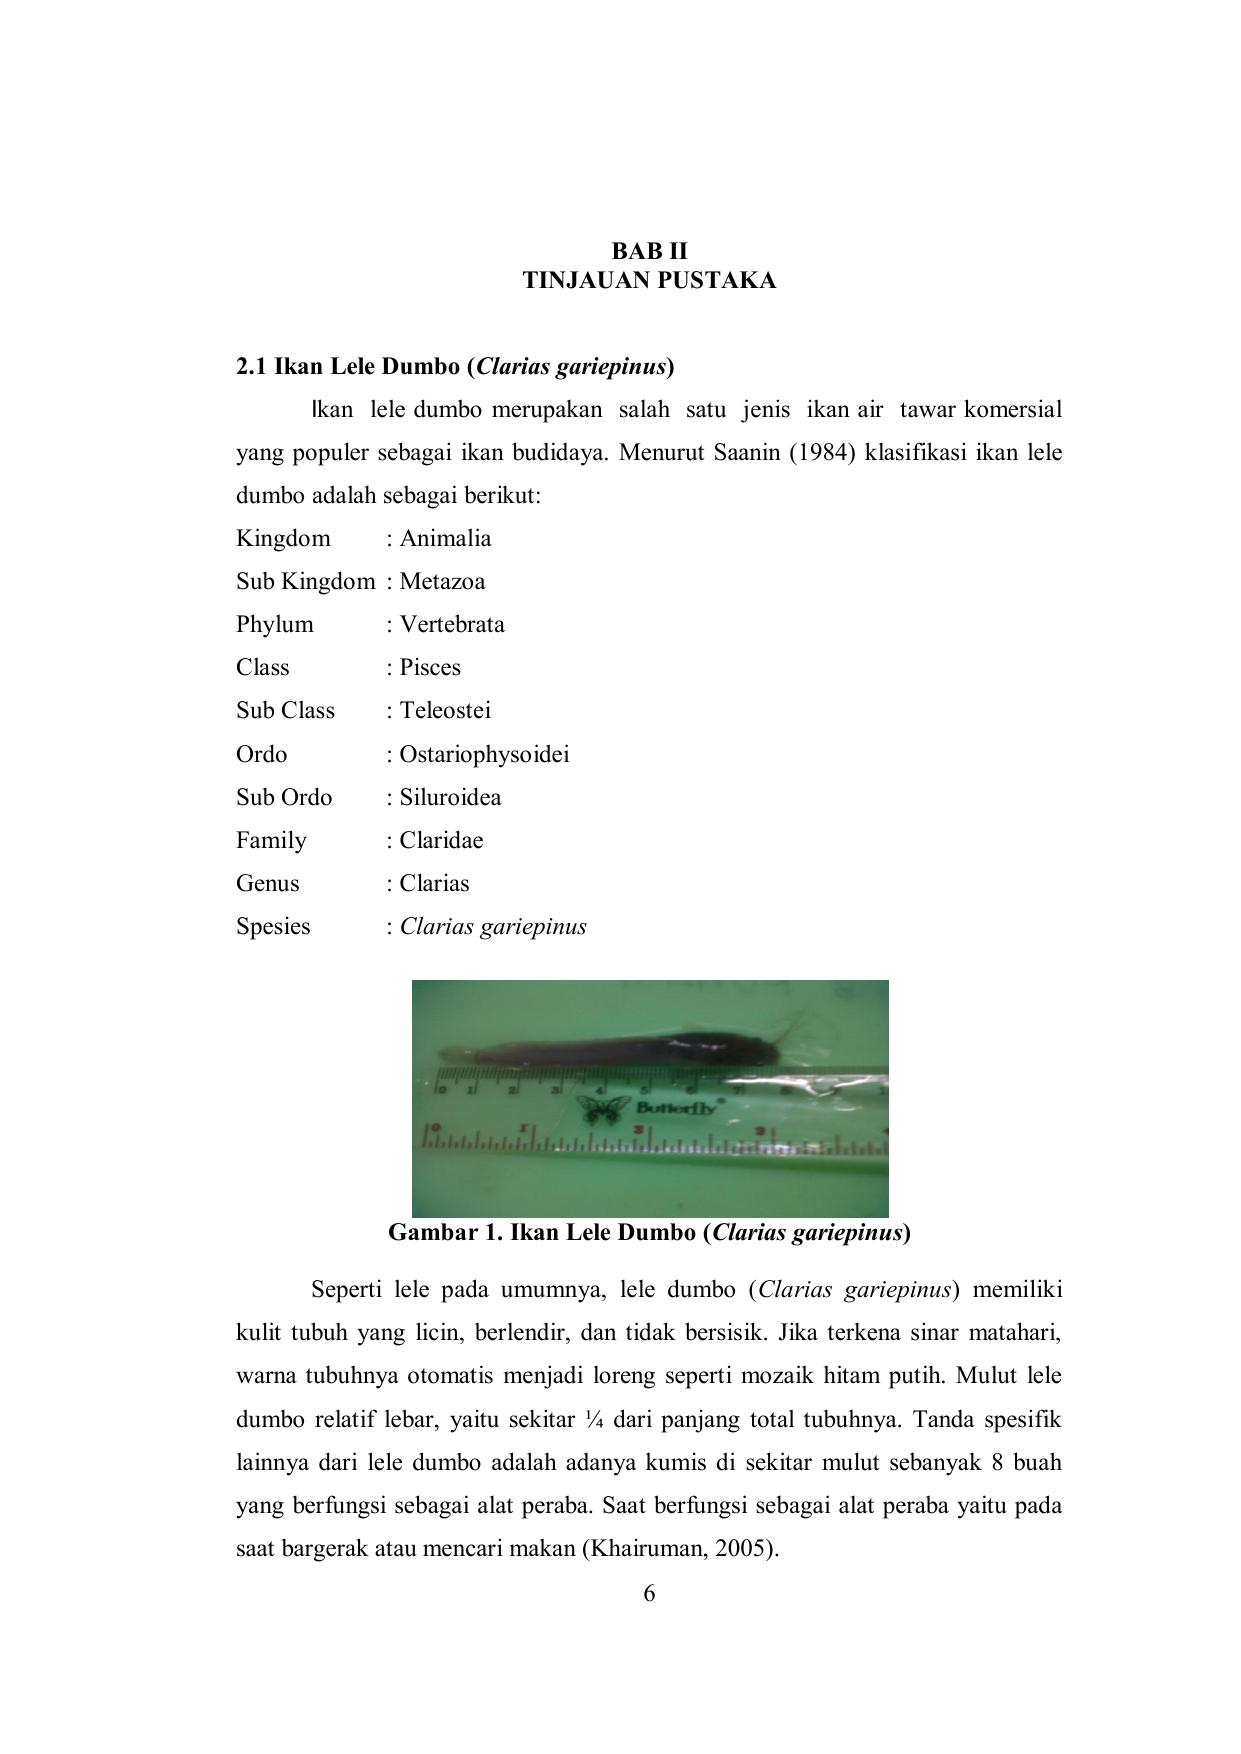 Unduh 6200 Gambar Usus Ikan Lele HD Terbaru